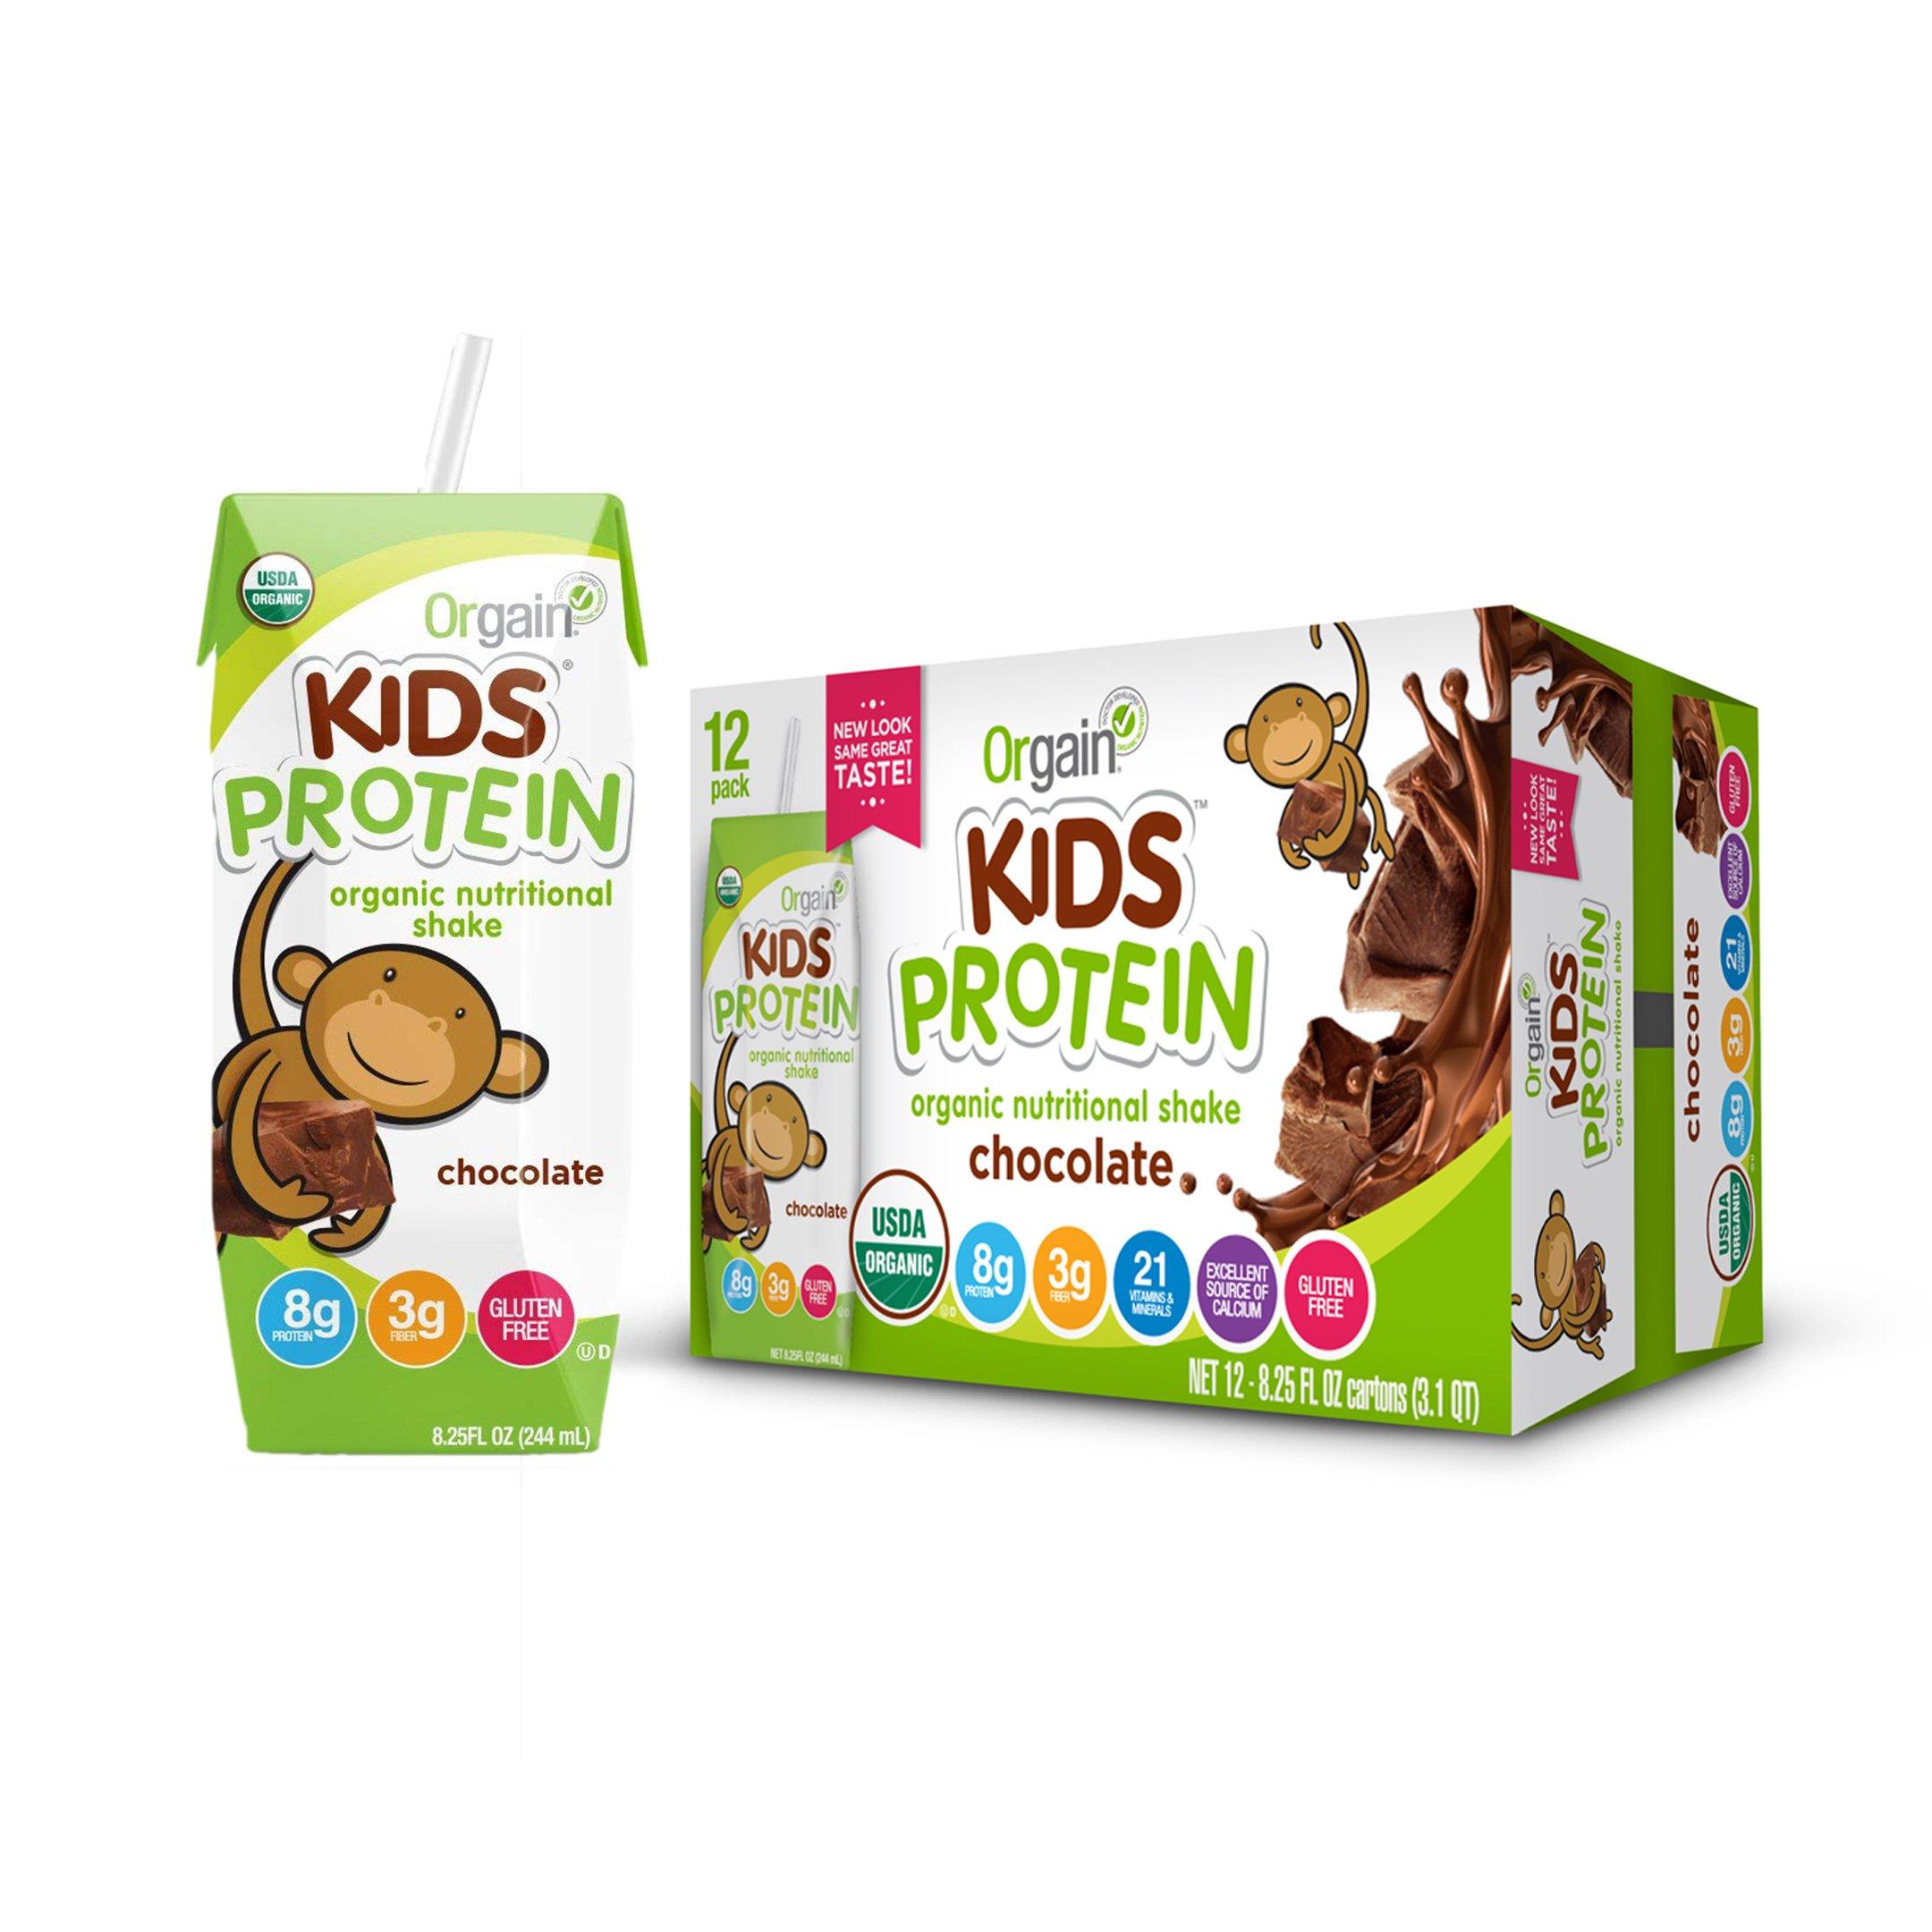 Orgain Kids Protein Organic Nutritional Shake, Chocolate, Gluten Free, Kosher, Non-GMO, 8.25 Ounce, Pack of 12